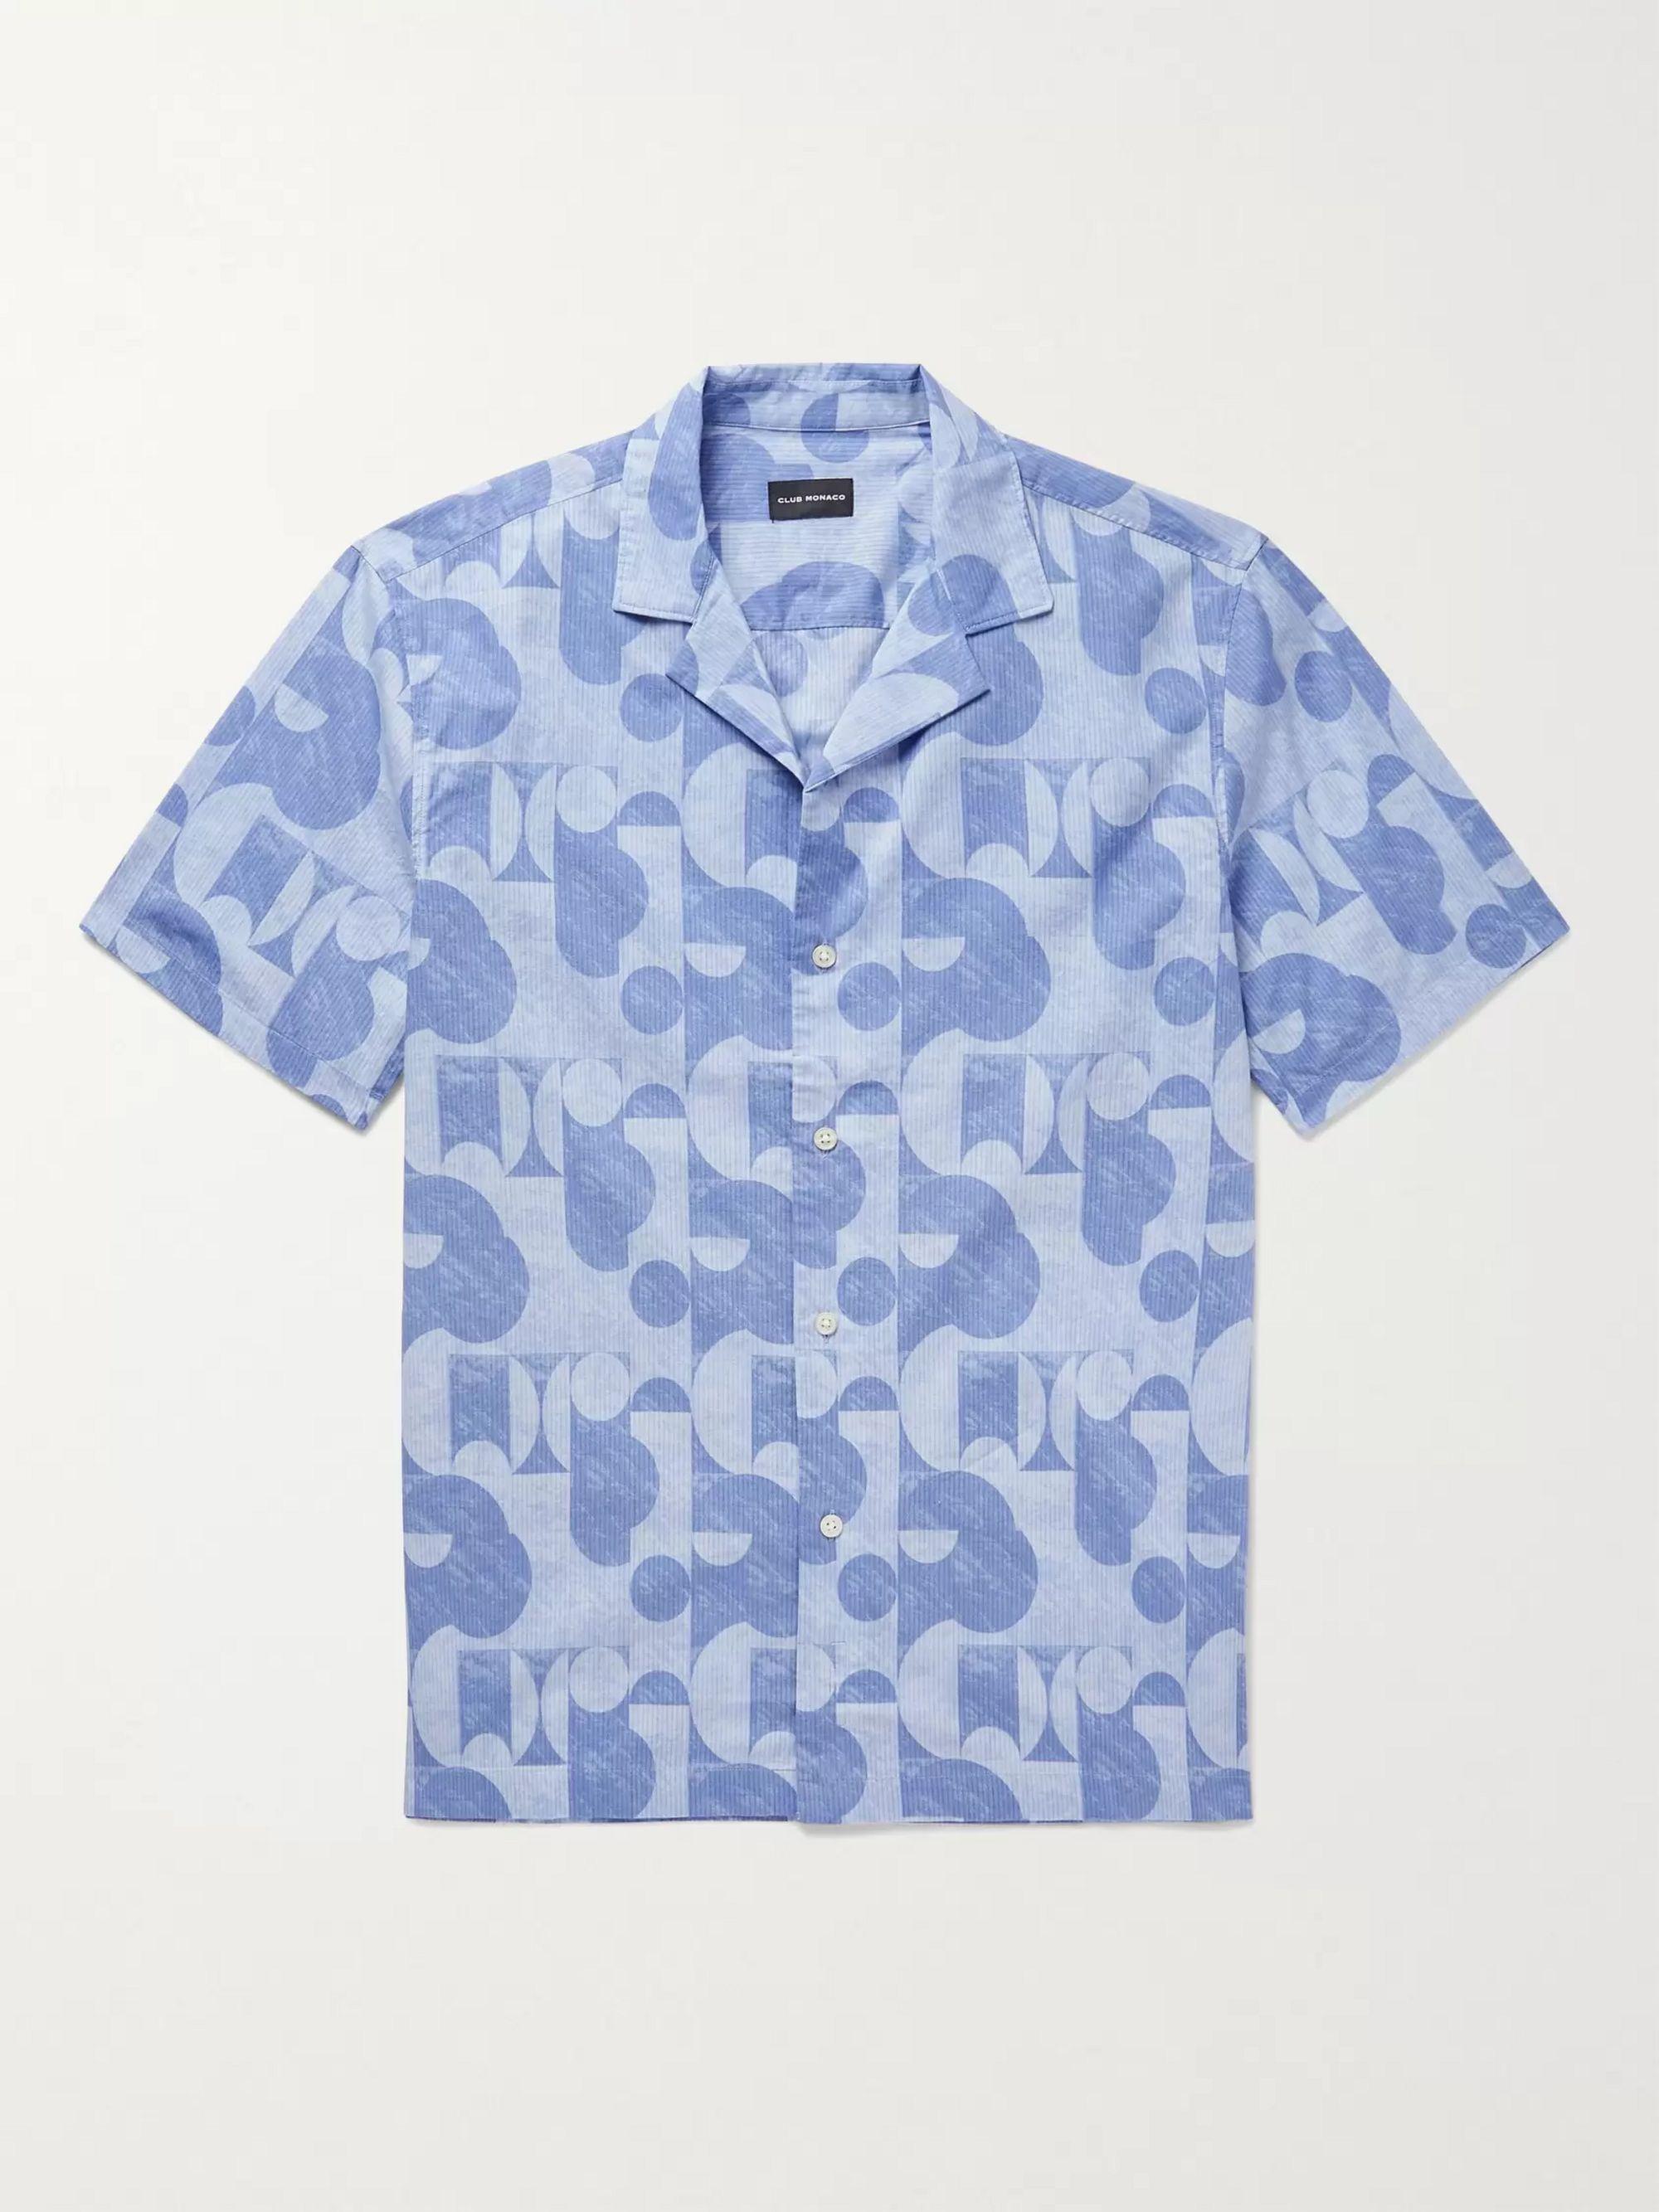 CLUB MONACO Camp-Collar Printed Cotton Shirt